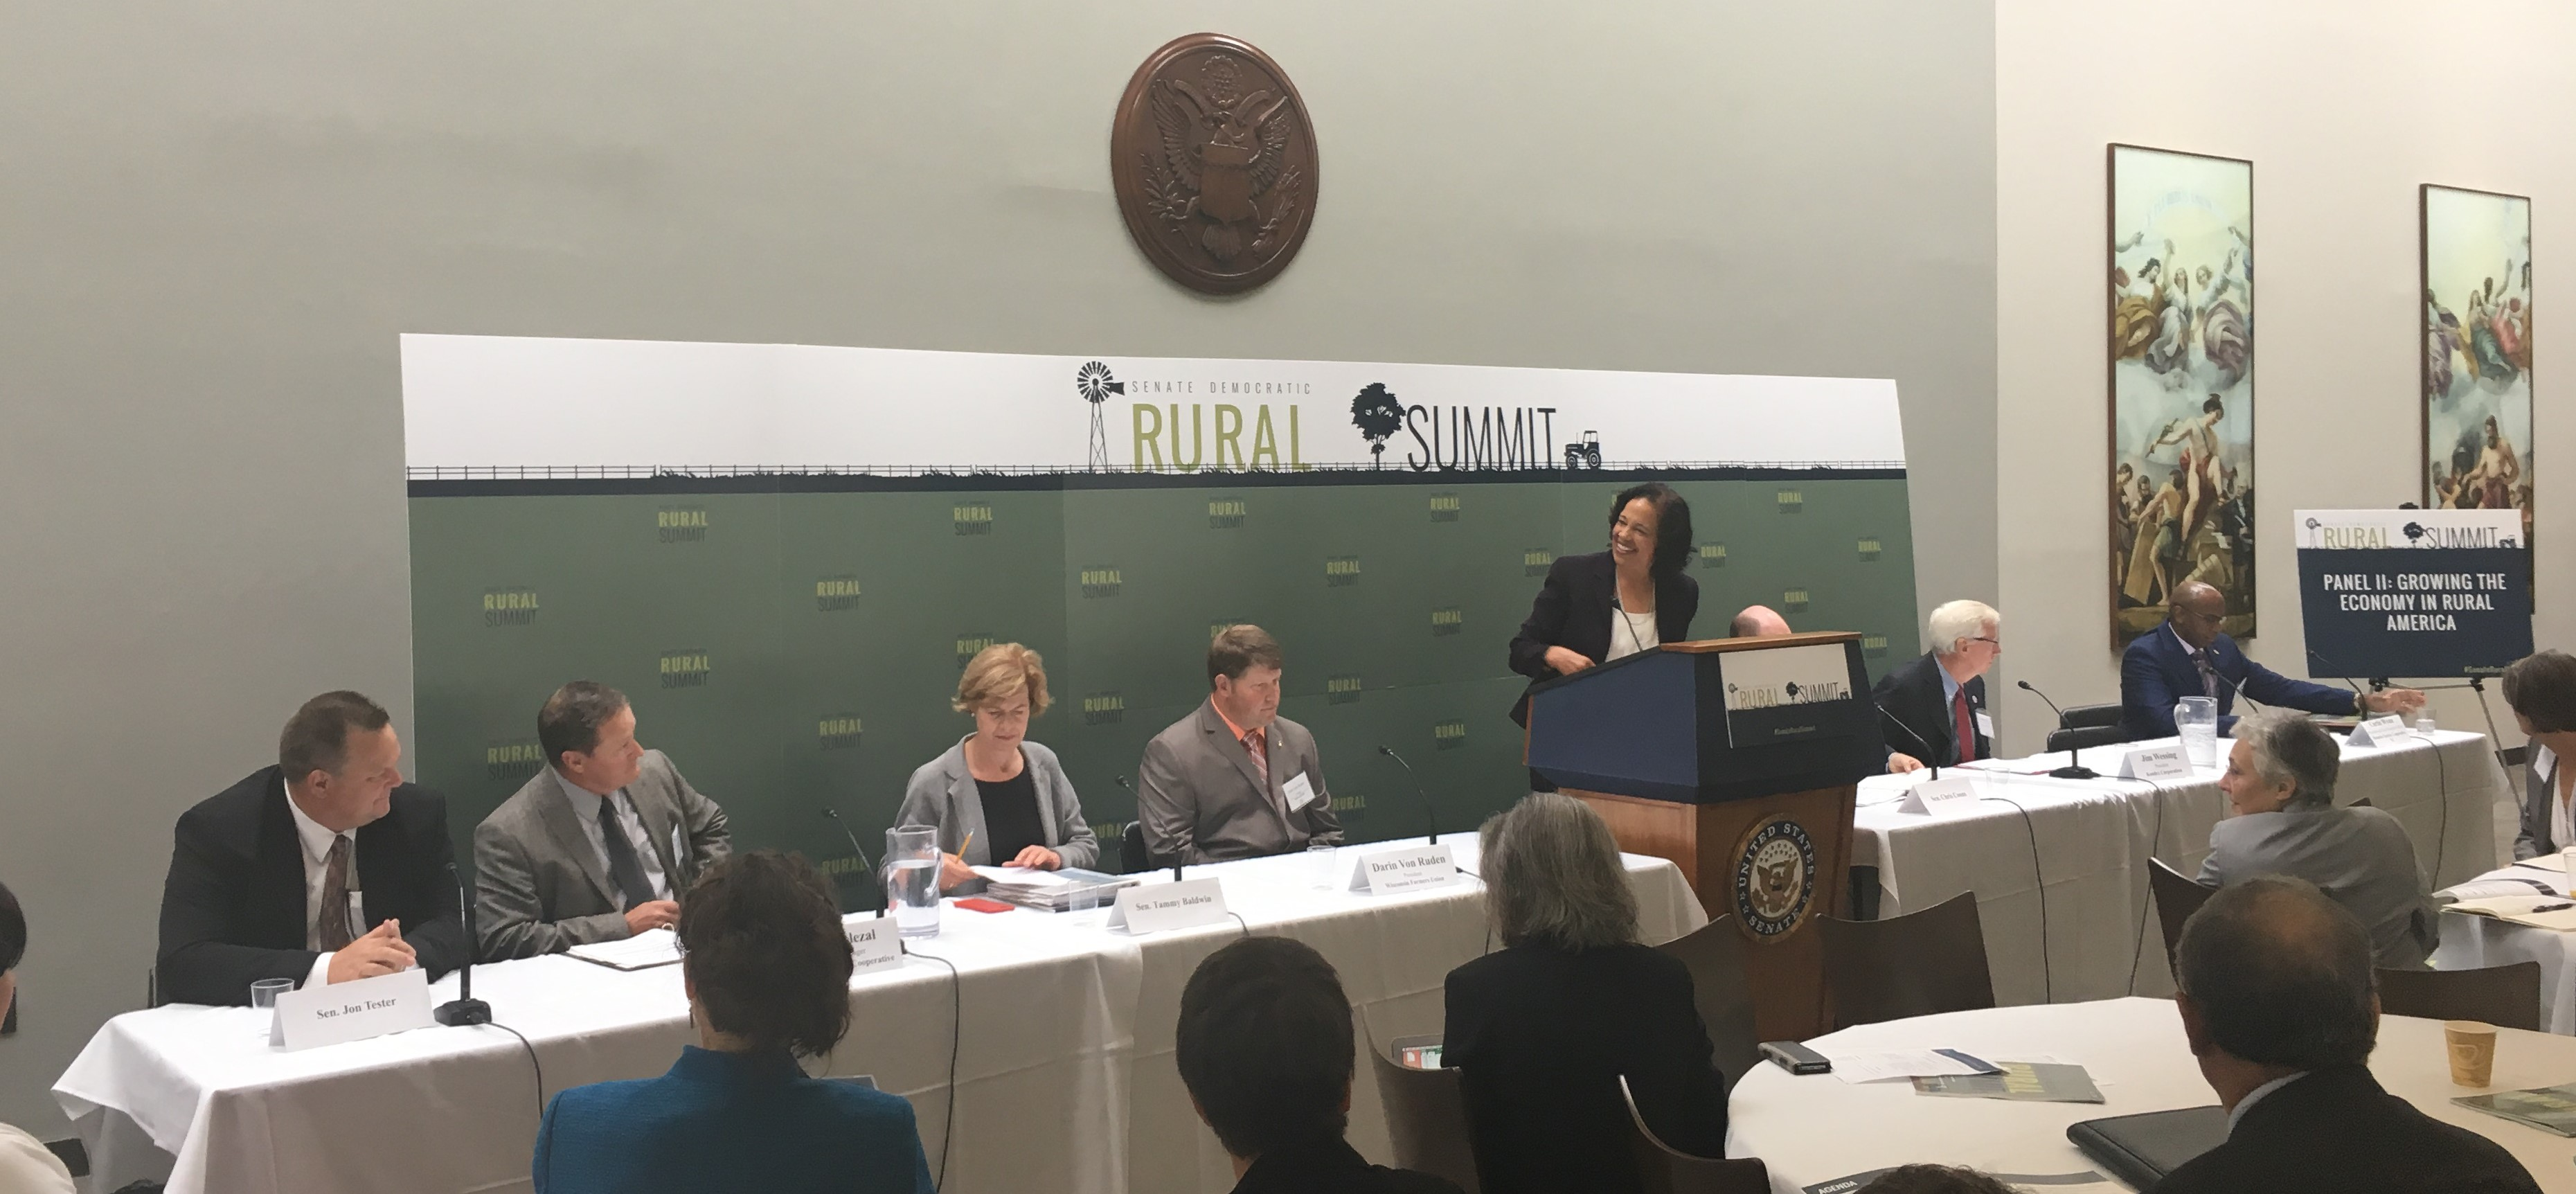 Photo of Senate Rural Summit